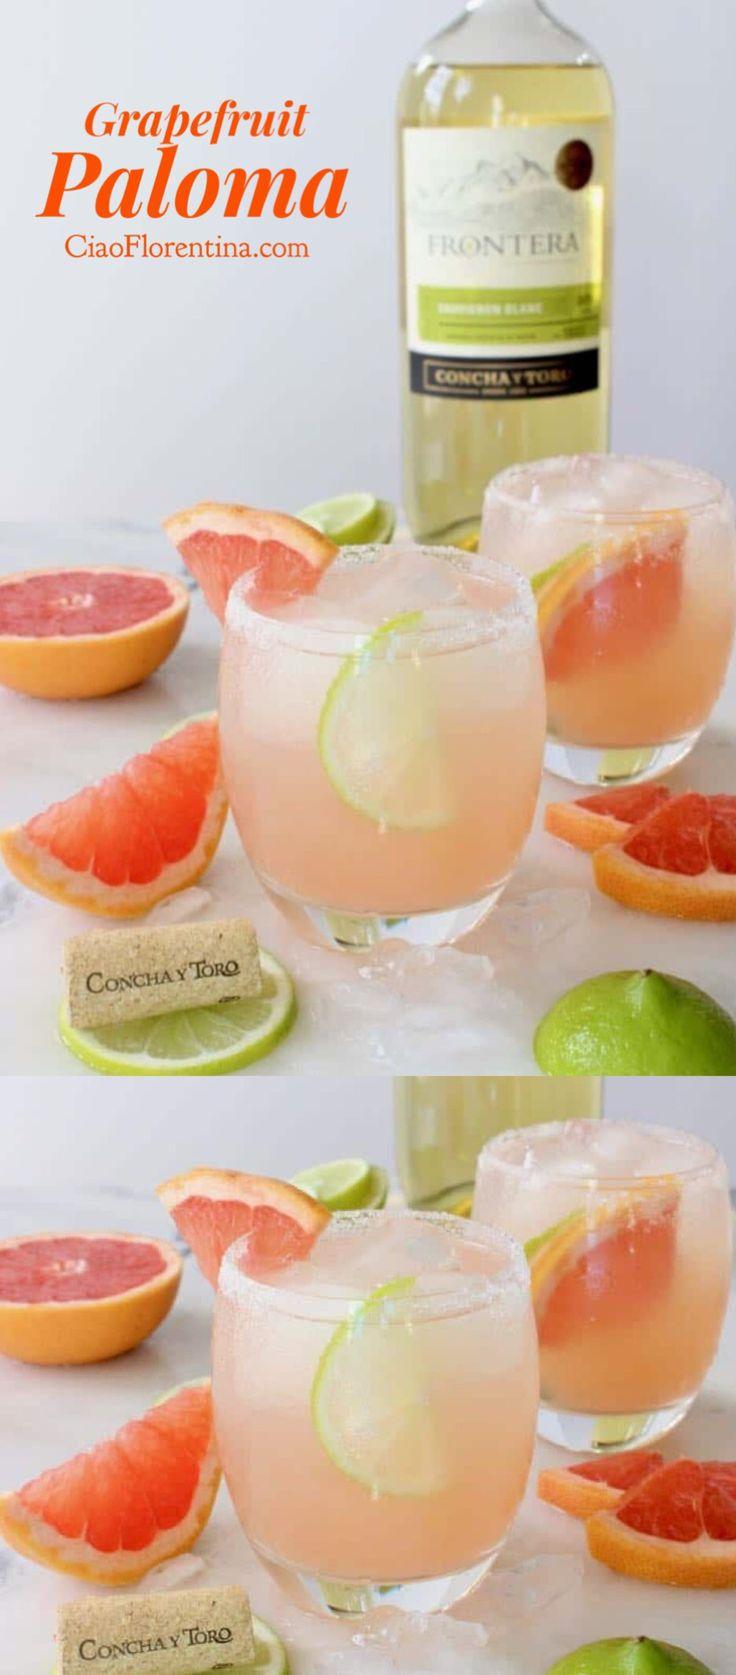 Paloma Cocktail Recipe | CiaoFlorentina.com @CiaoFlorentina